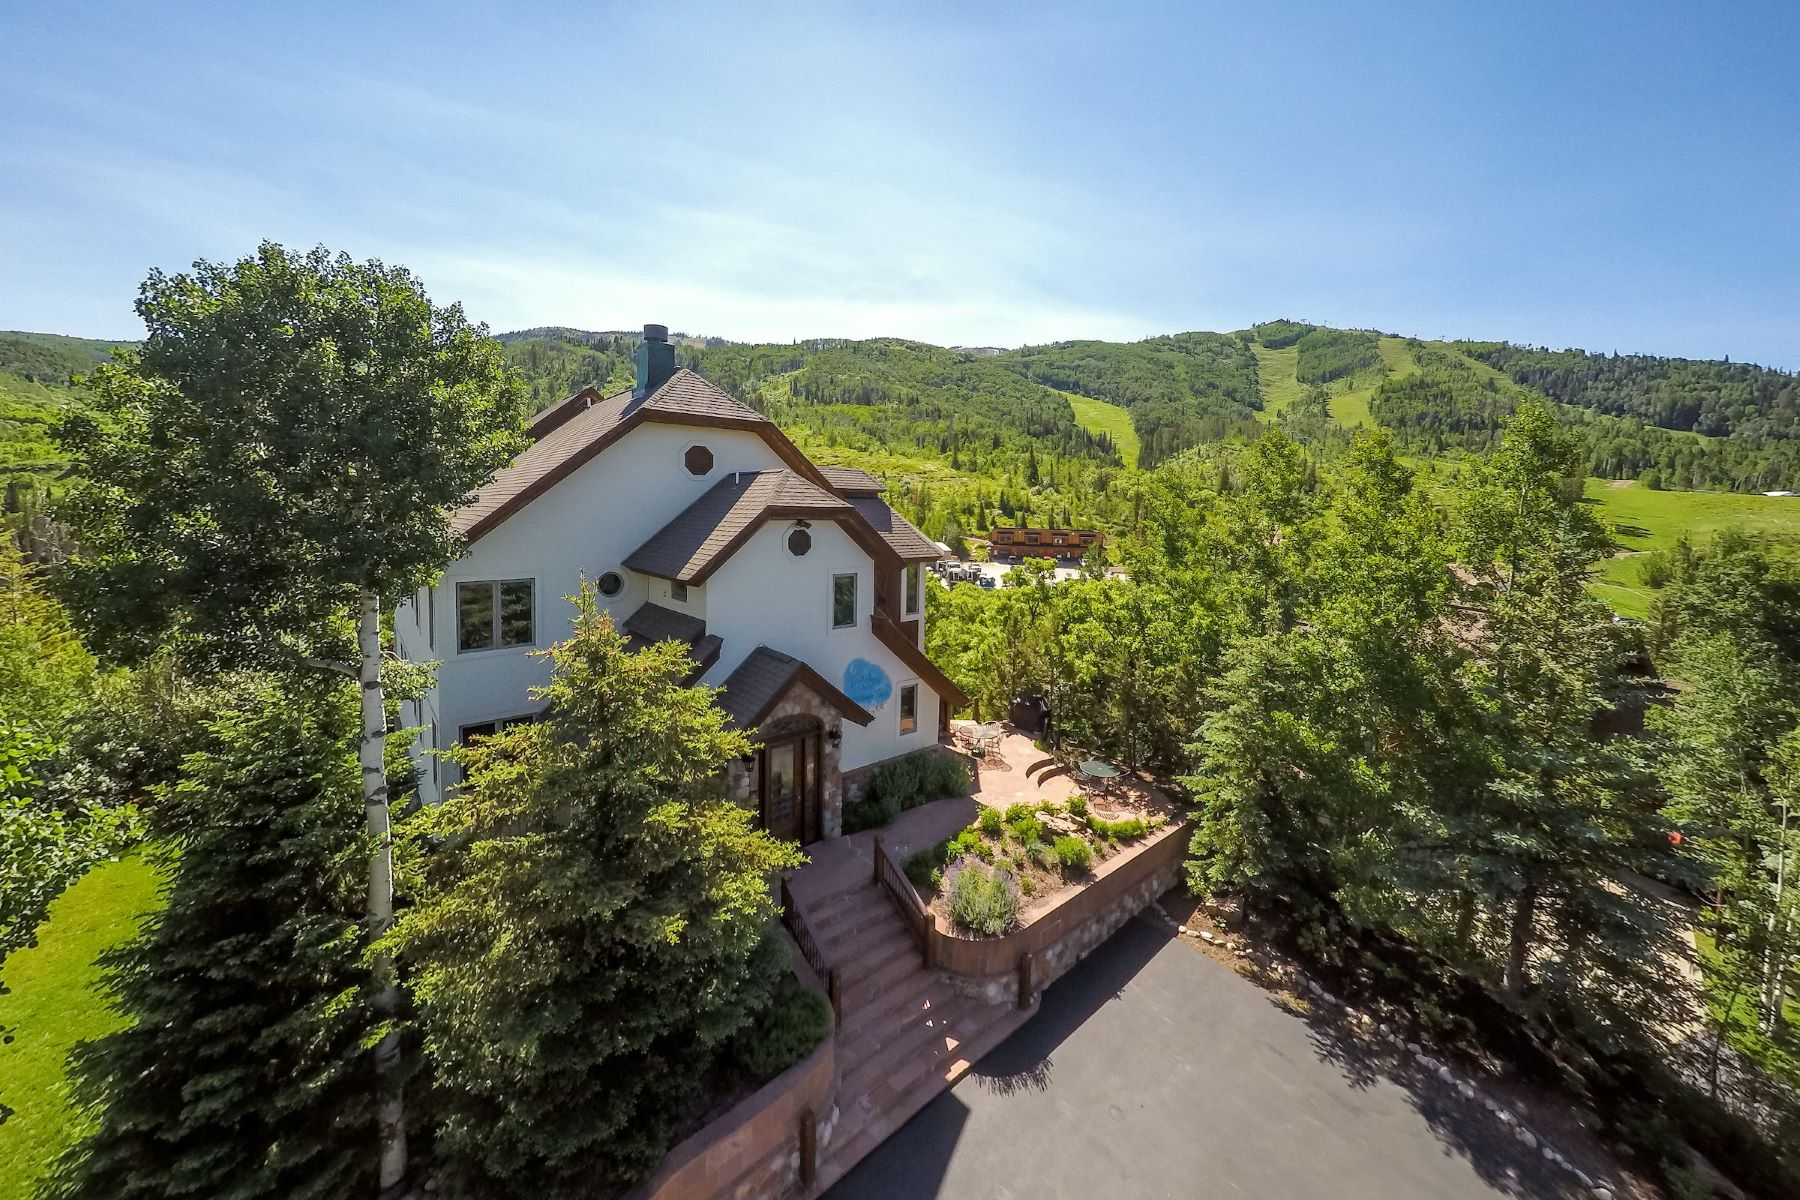 Частный односемейный дом для того Продажа на Edelweiss Chalet 3040 Temple Knoll Steamboat Springs, Колорадо, 80487 Соединенные Штаты